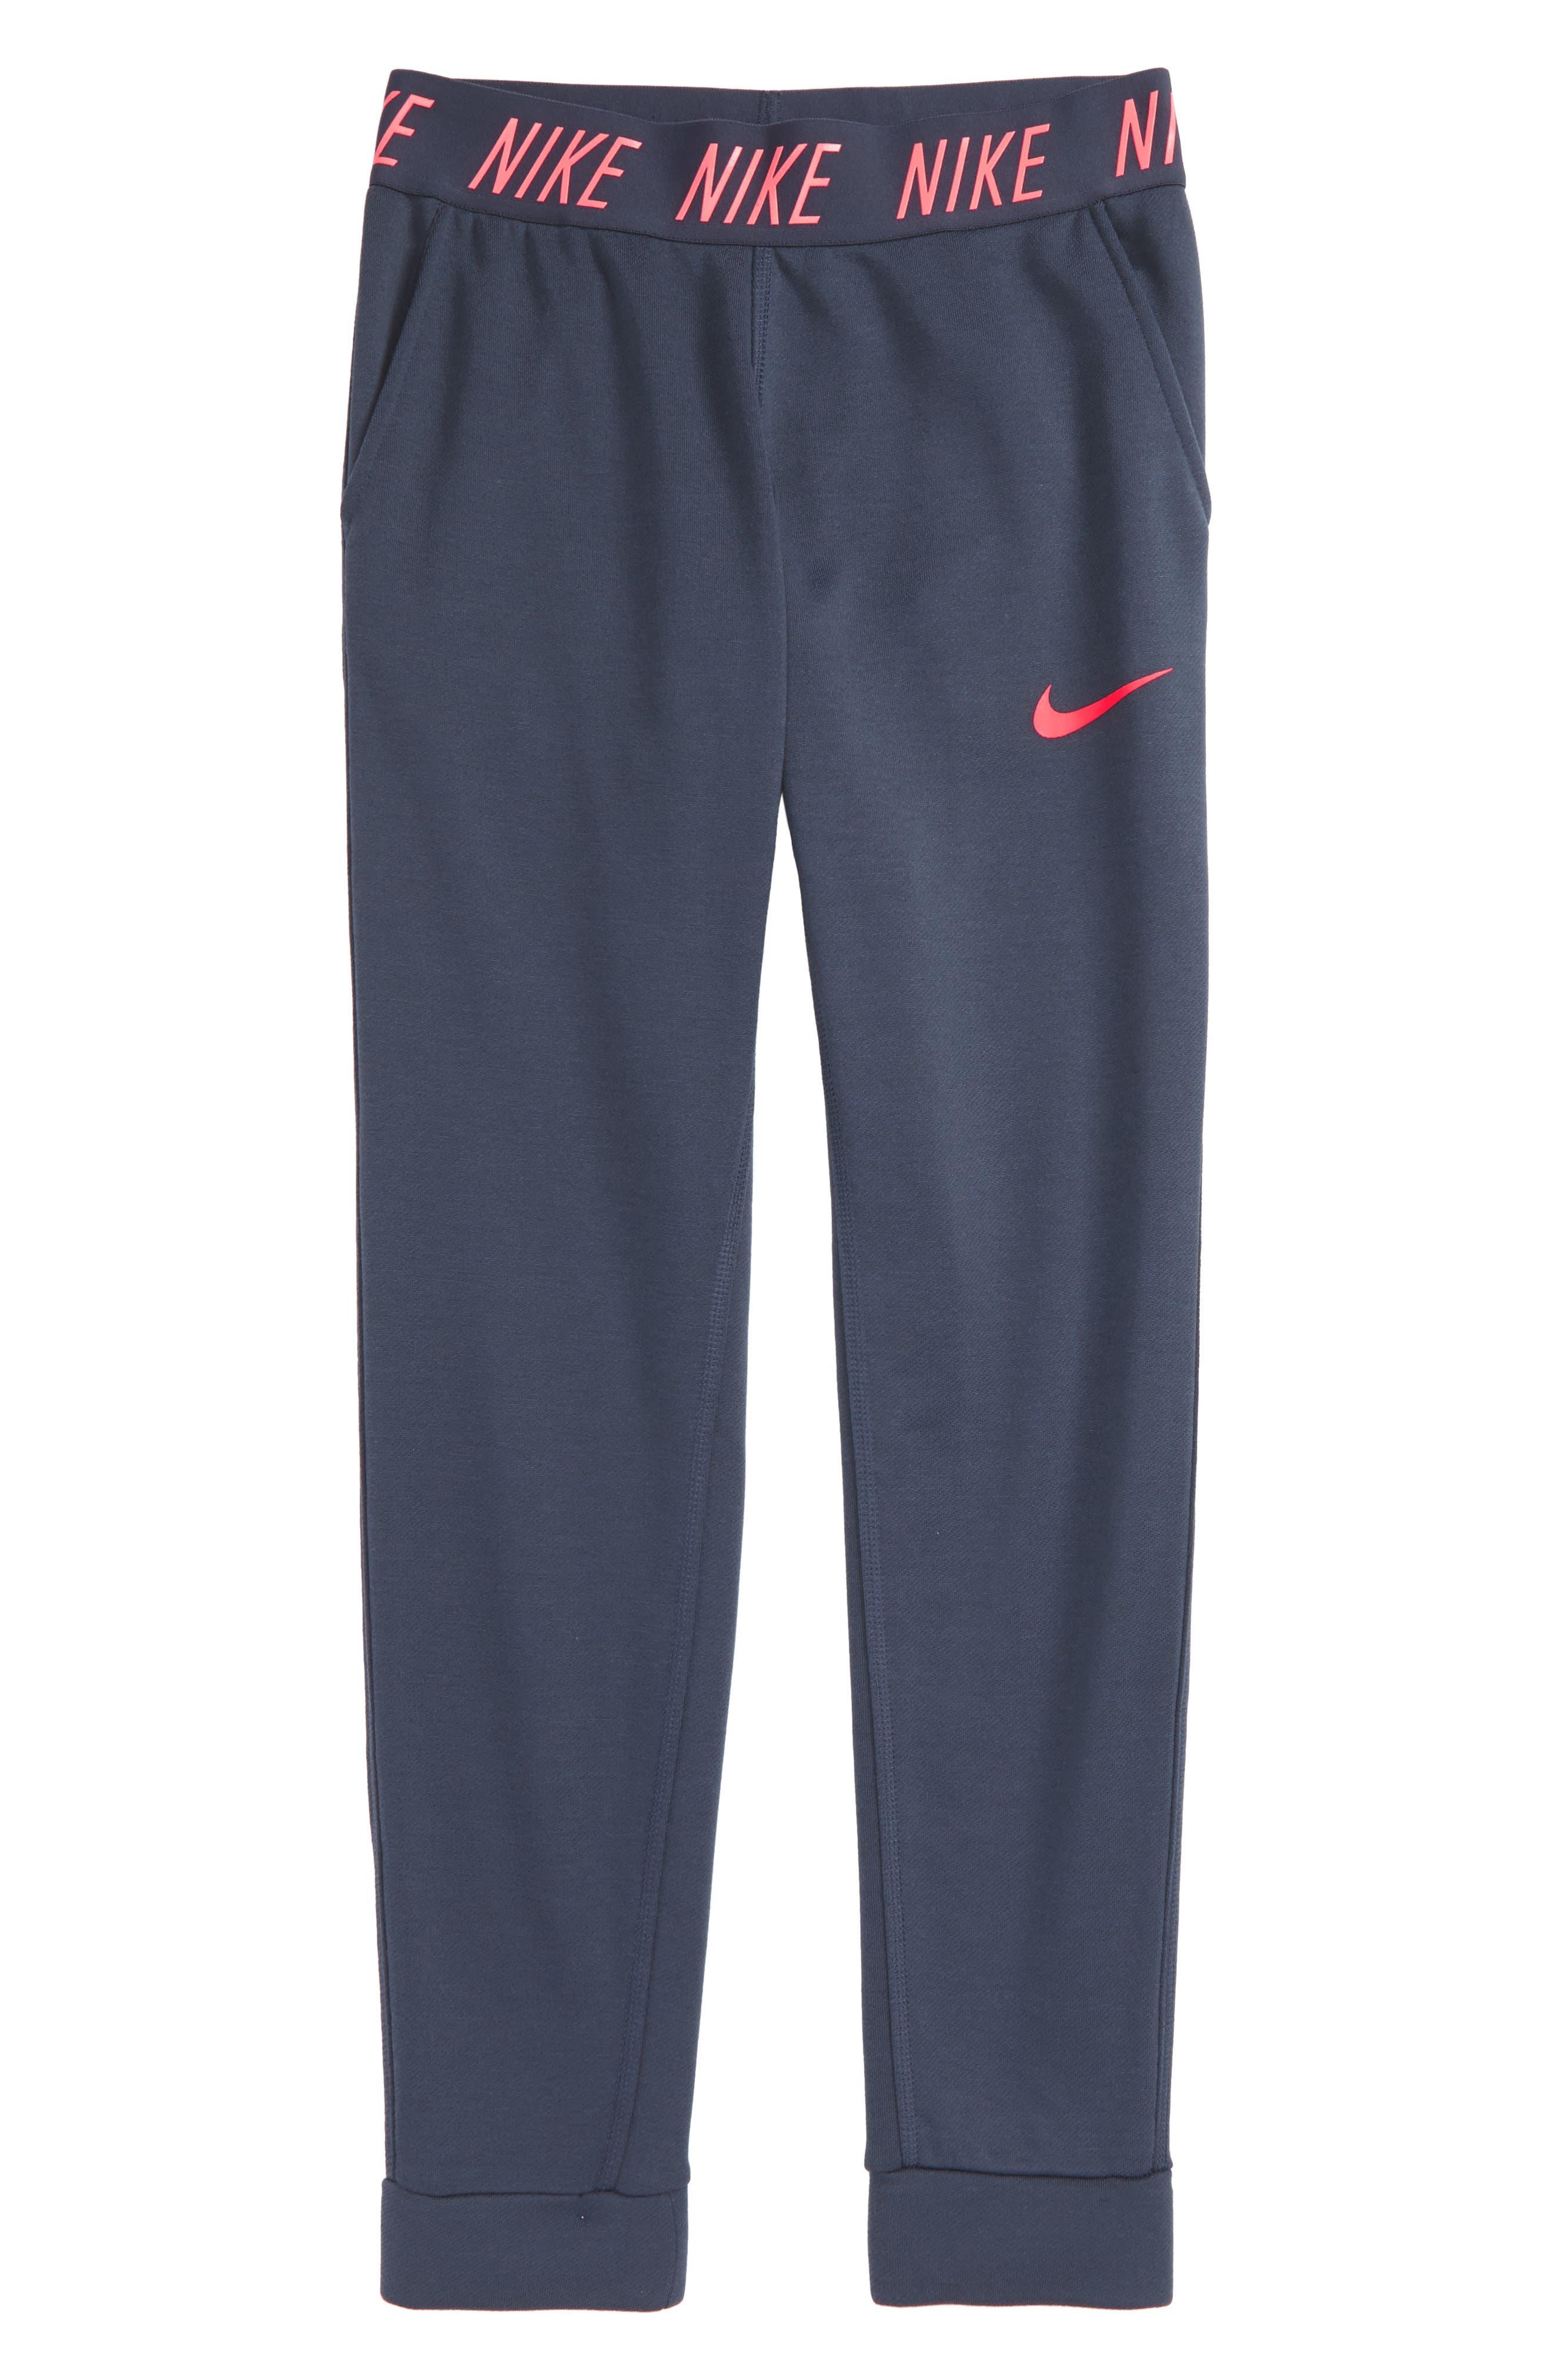 Nike Dry Core Studio Training Pants (Big Girls)